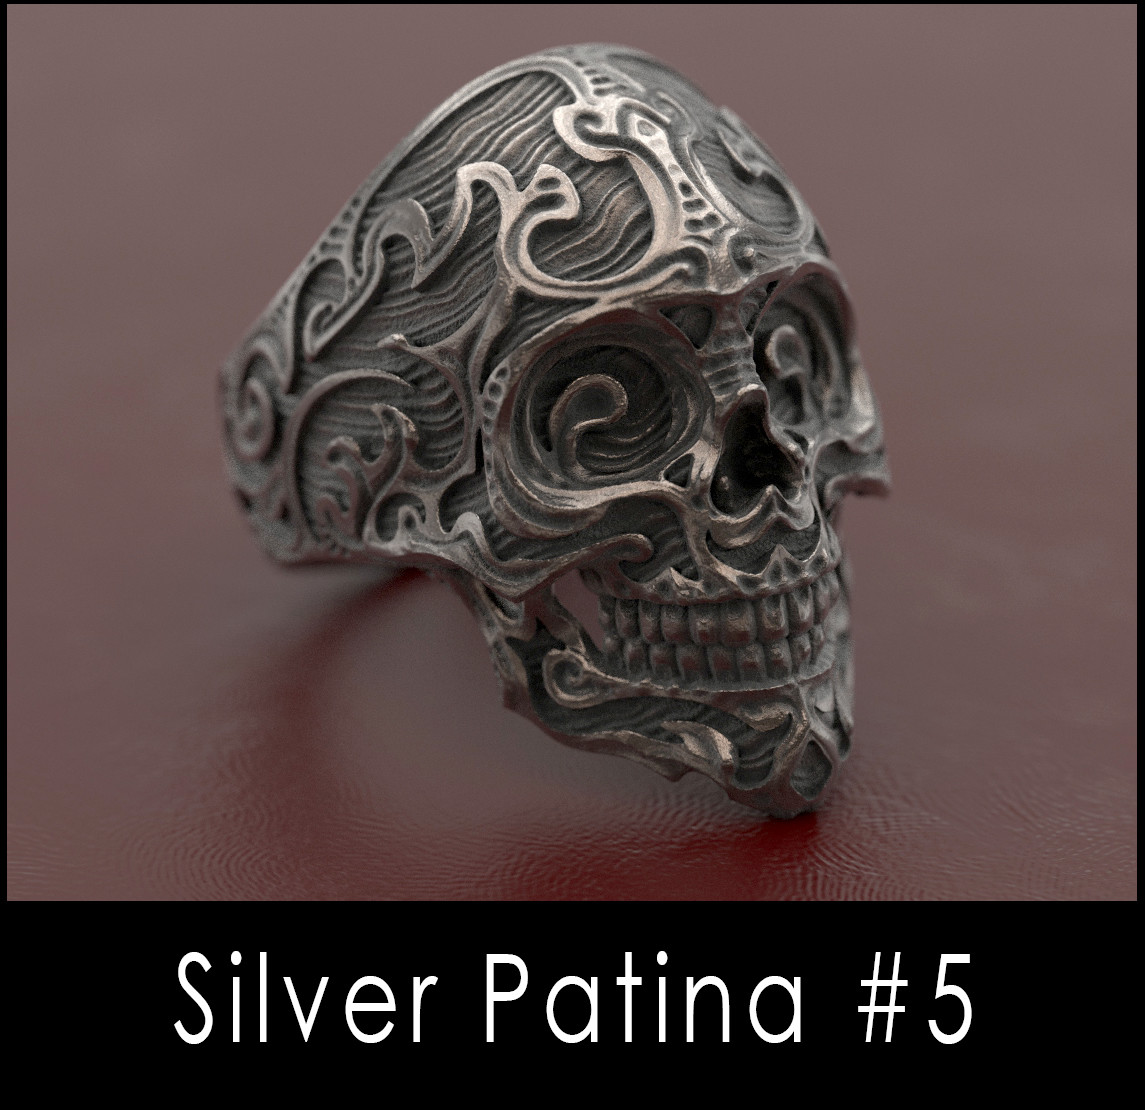 Nacho riesco gostanza silver patina n5